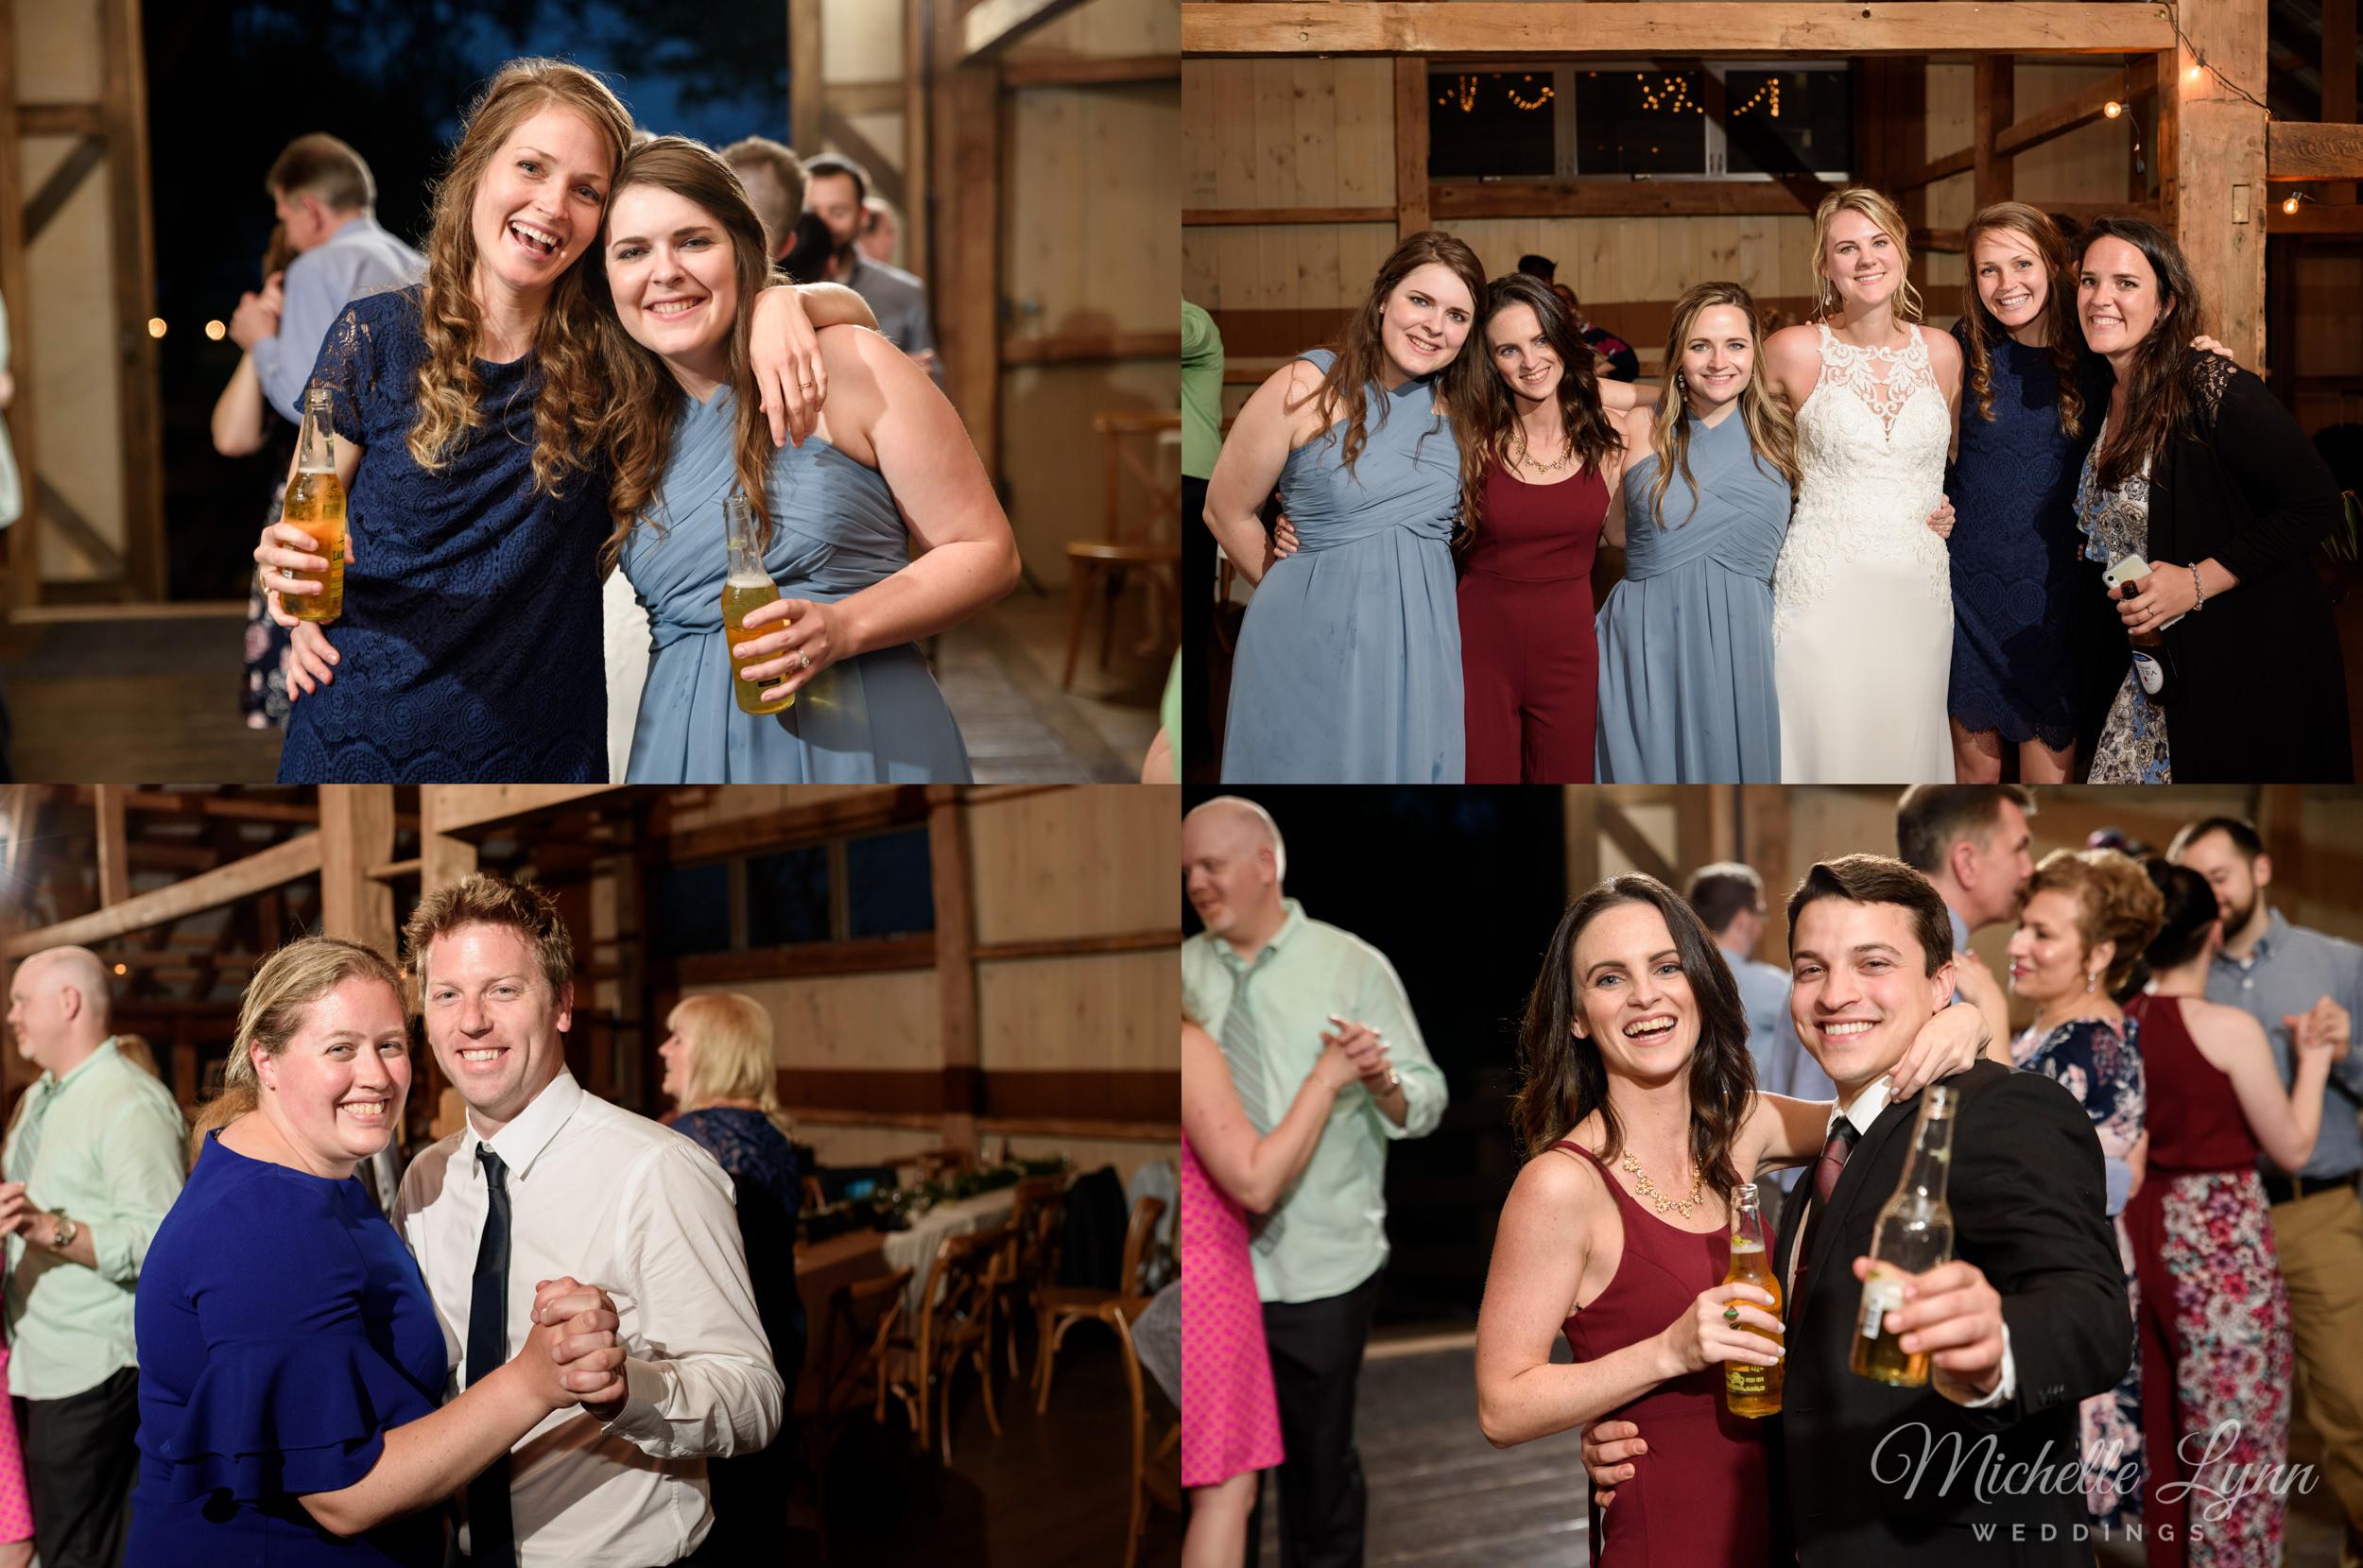 mlw-the-farm-bakery-and-events-wedding-photos-82.jpg